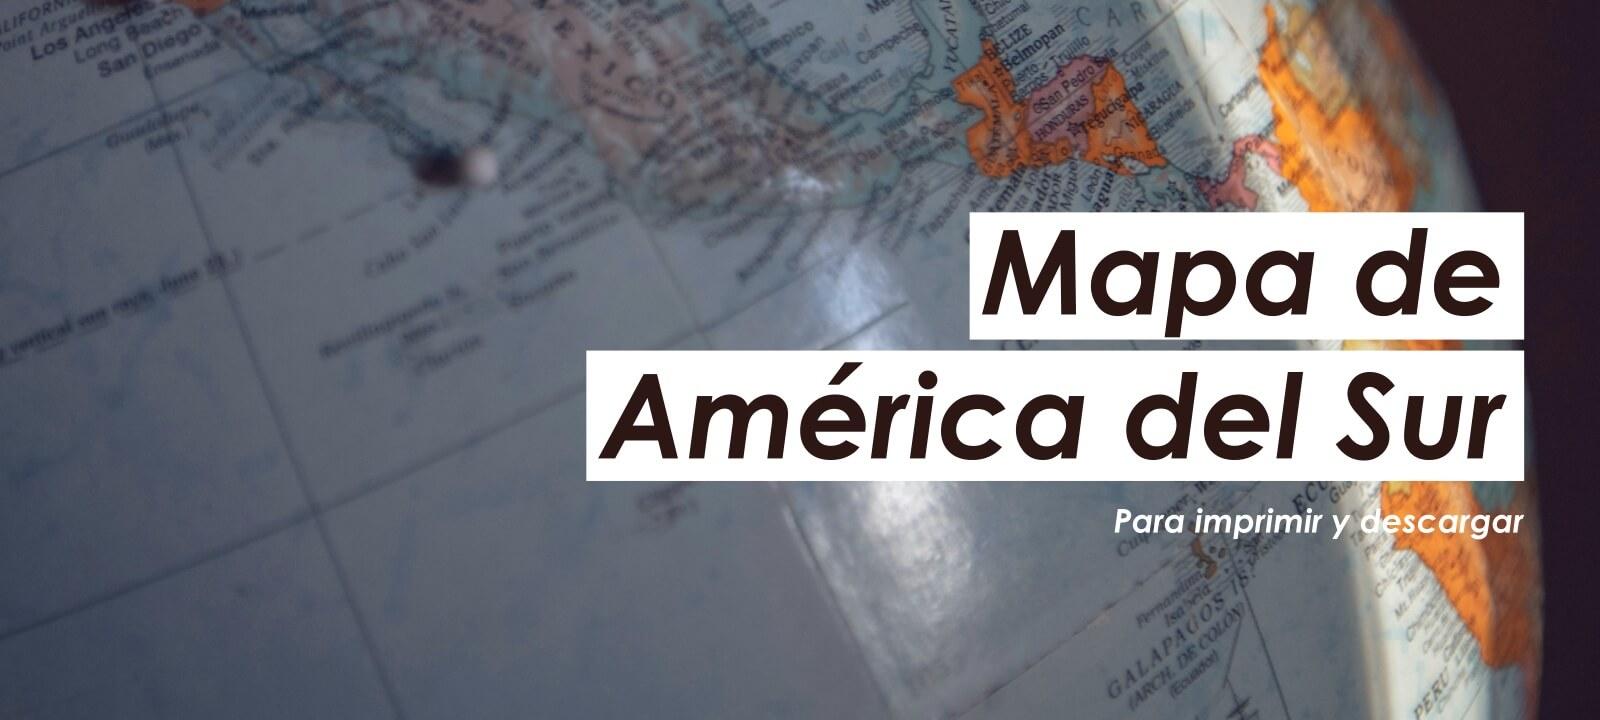 mapa de américa del sur para imprimir